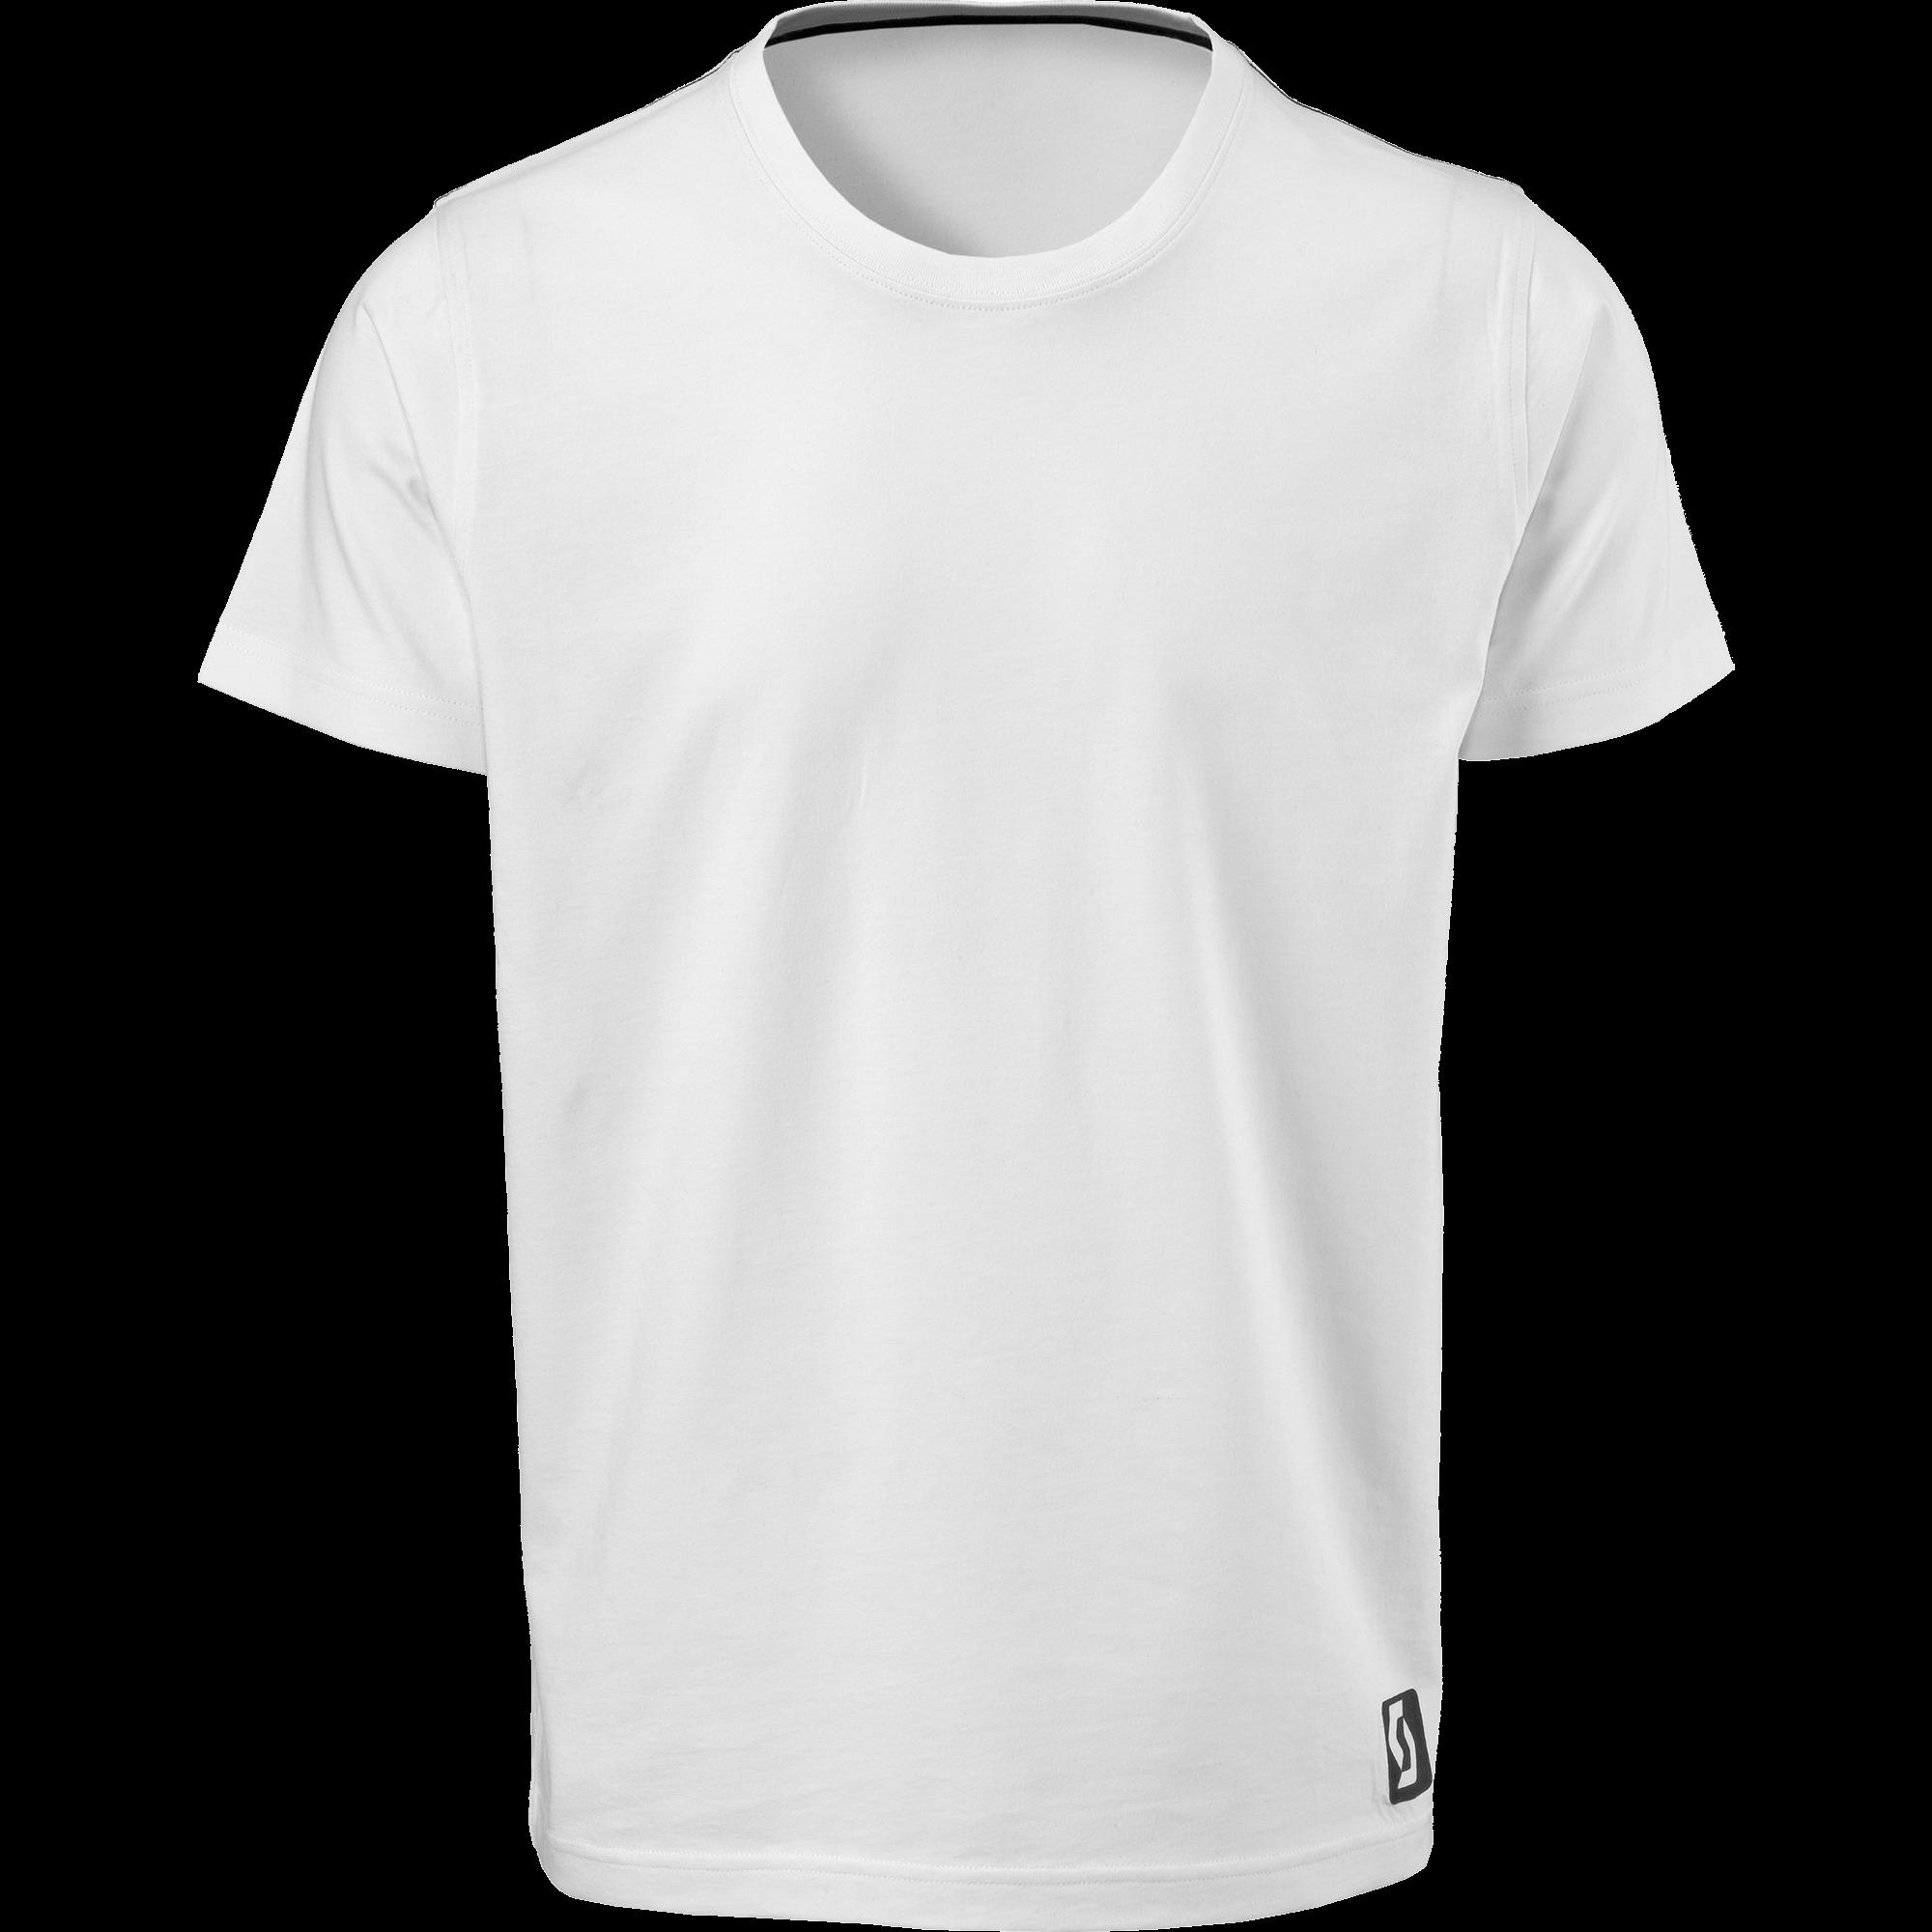 Download White T-Shirt Png Image HQ PNG Image | FreePNGImg